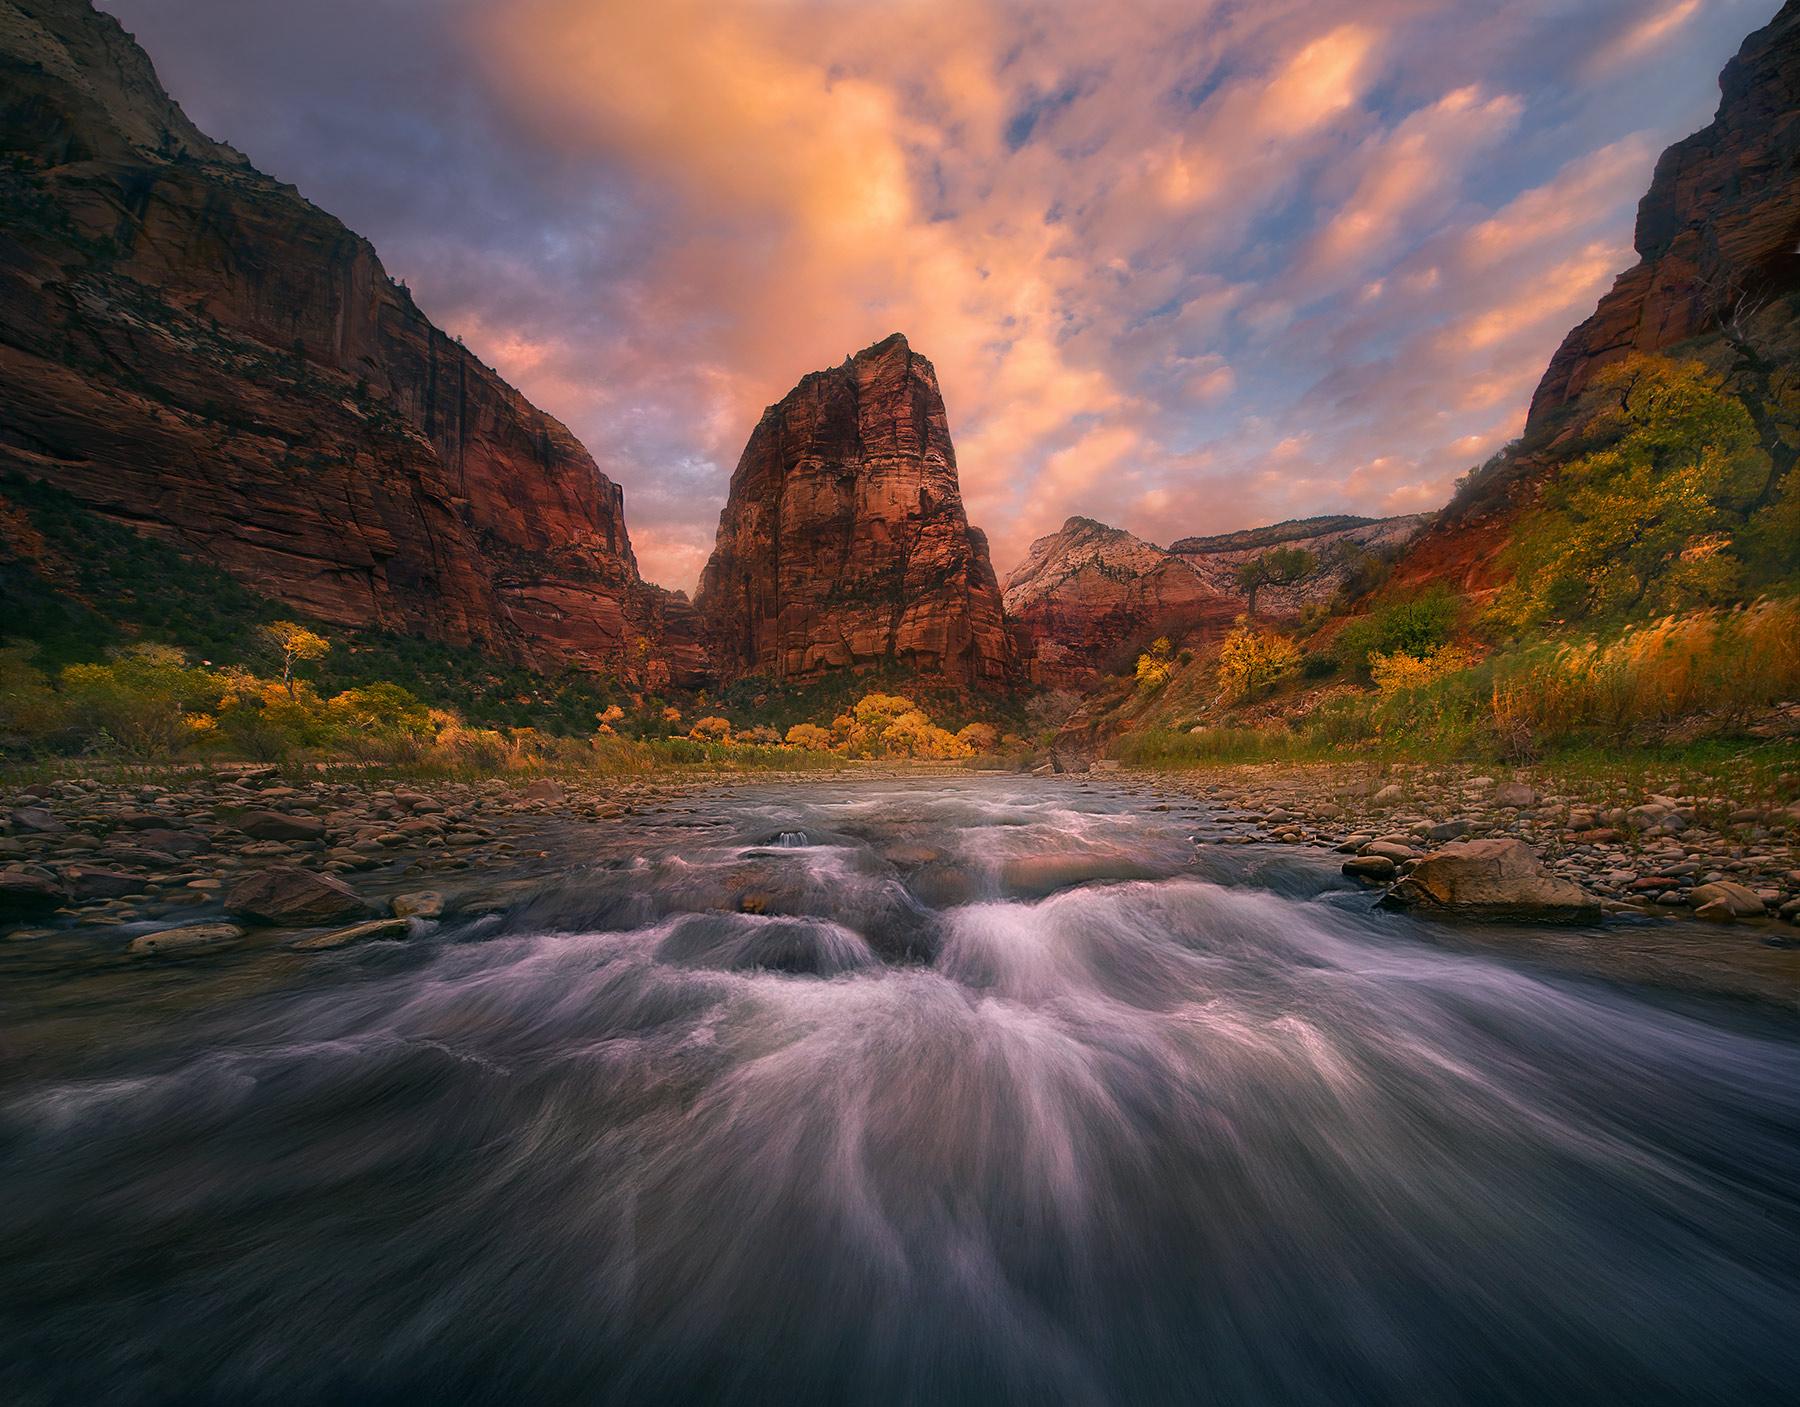 Virgin River, Zion, Angel's Landing, sunrise, beautiful, fall, photo